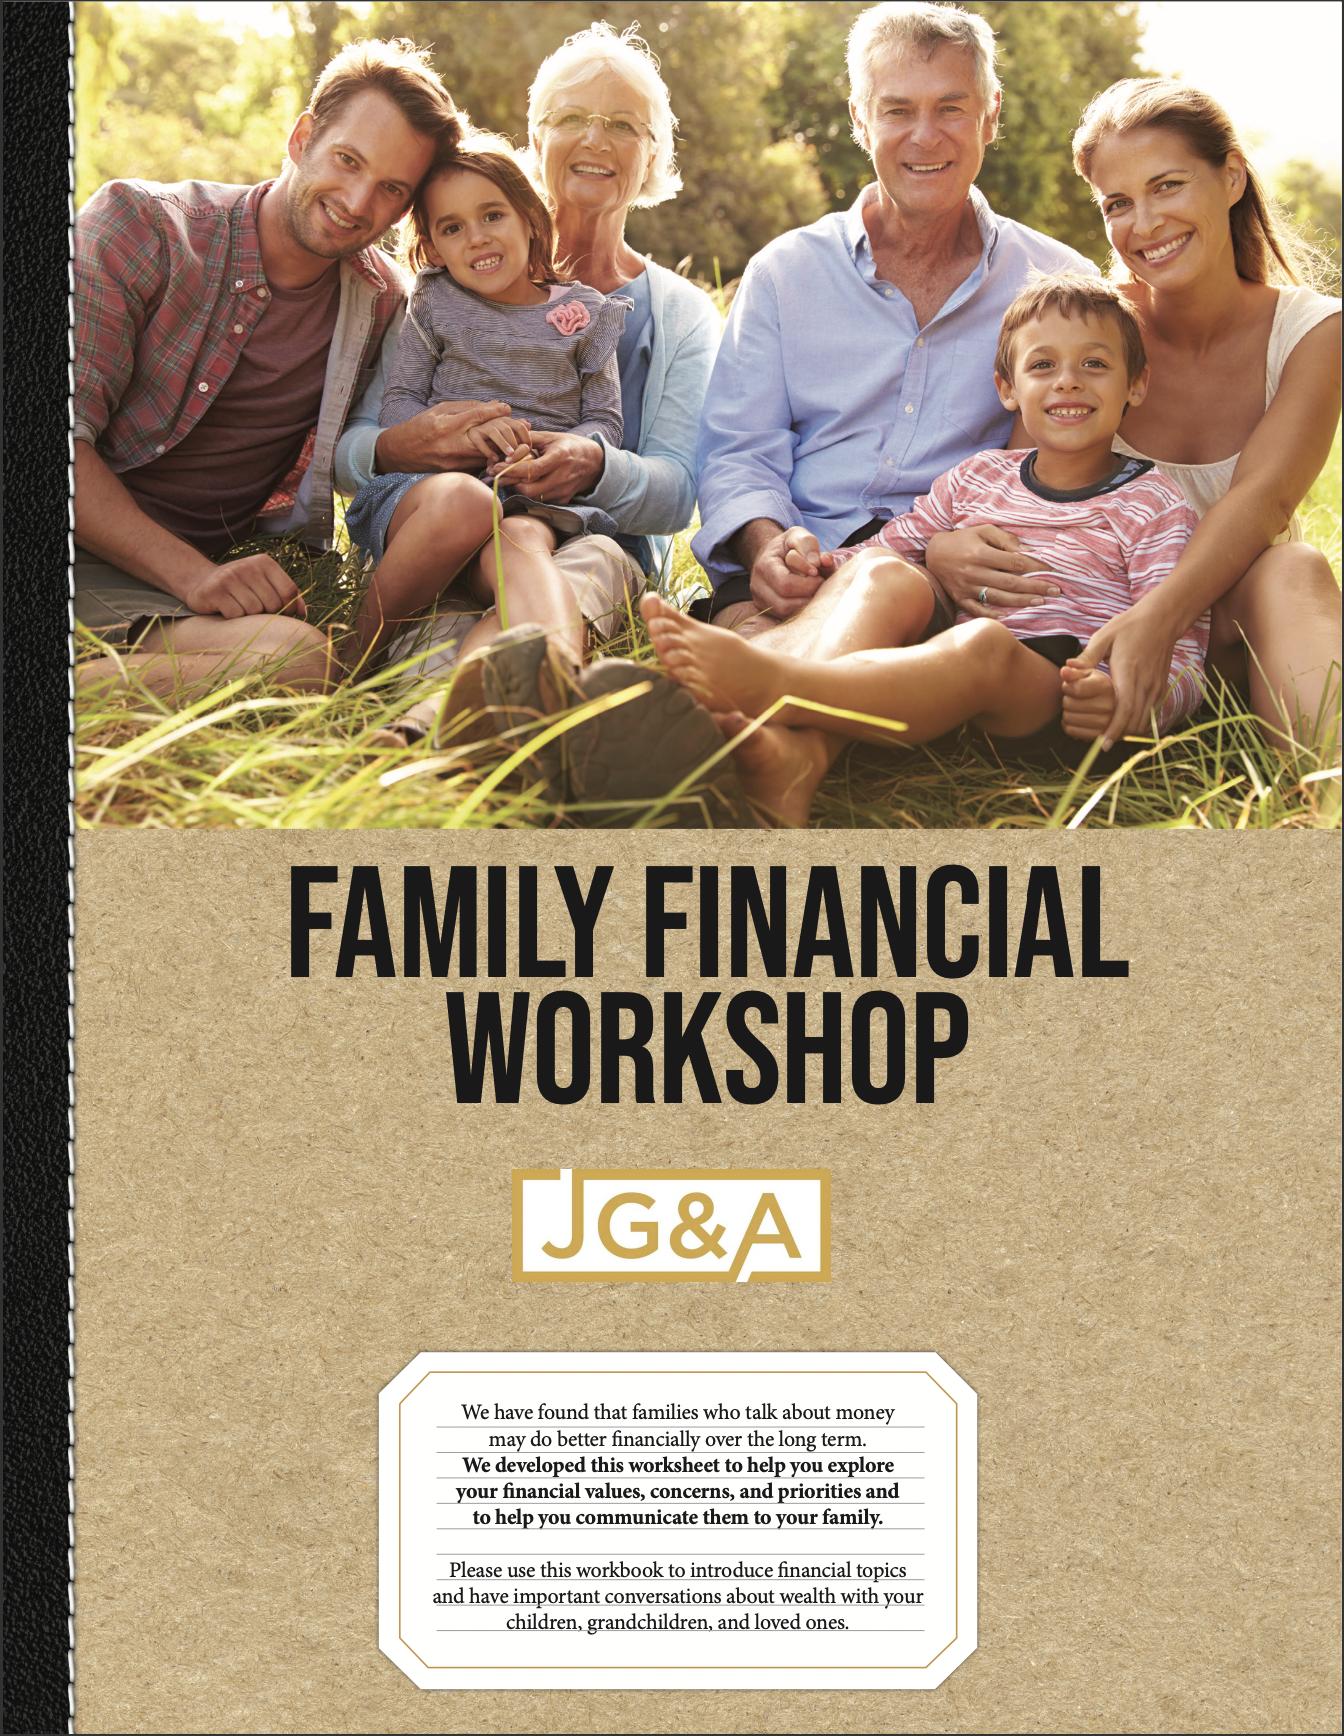 Family Financial Workshop Workbook Thumbnail